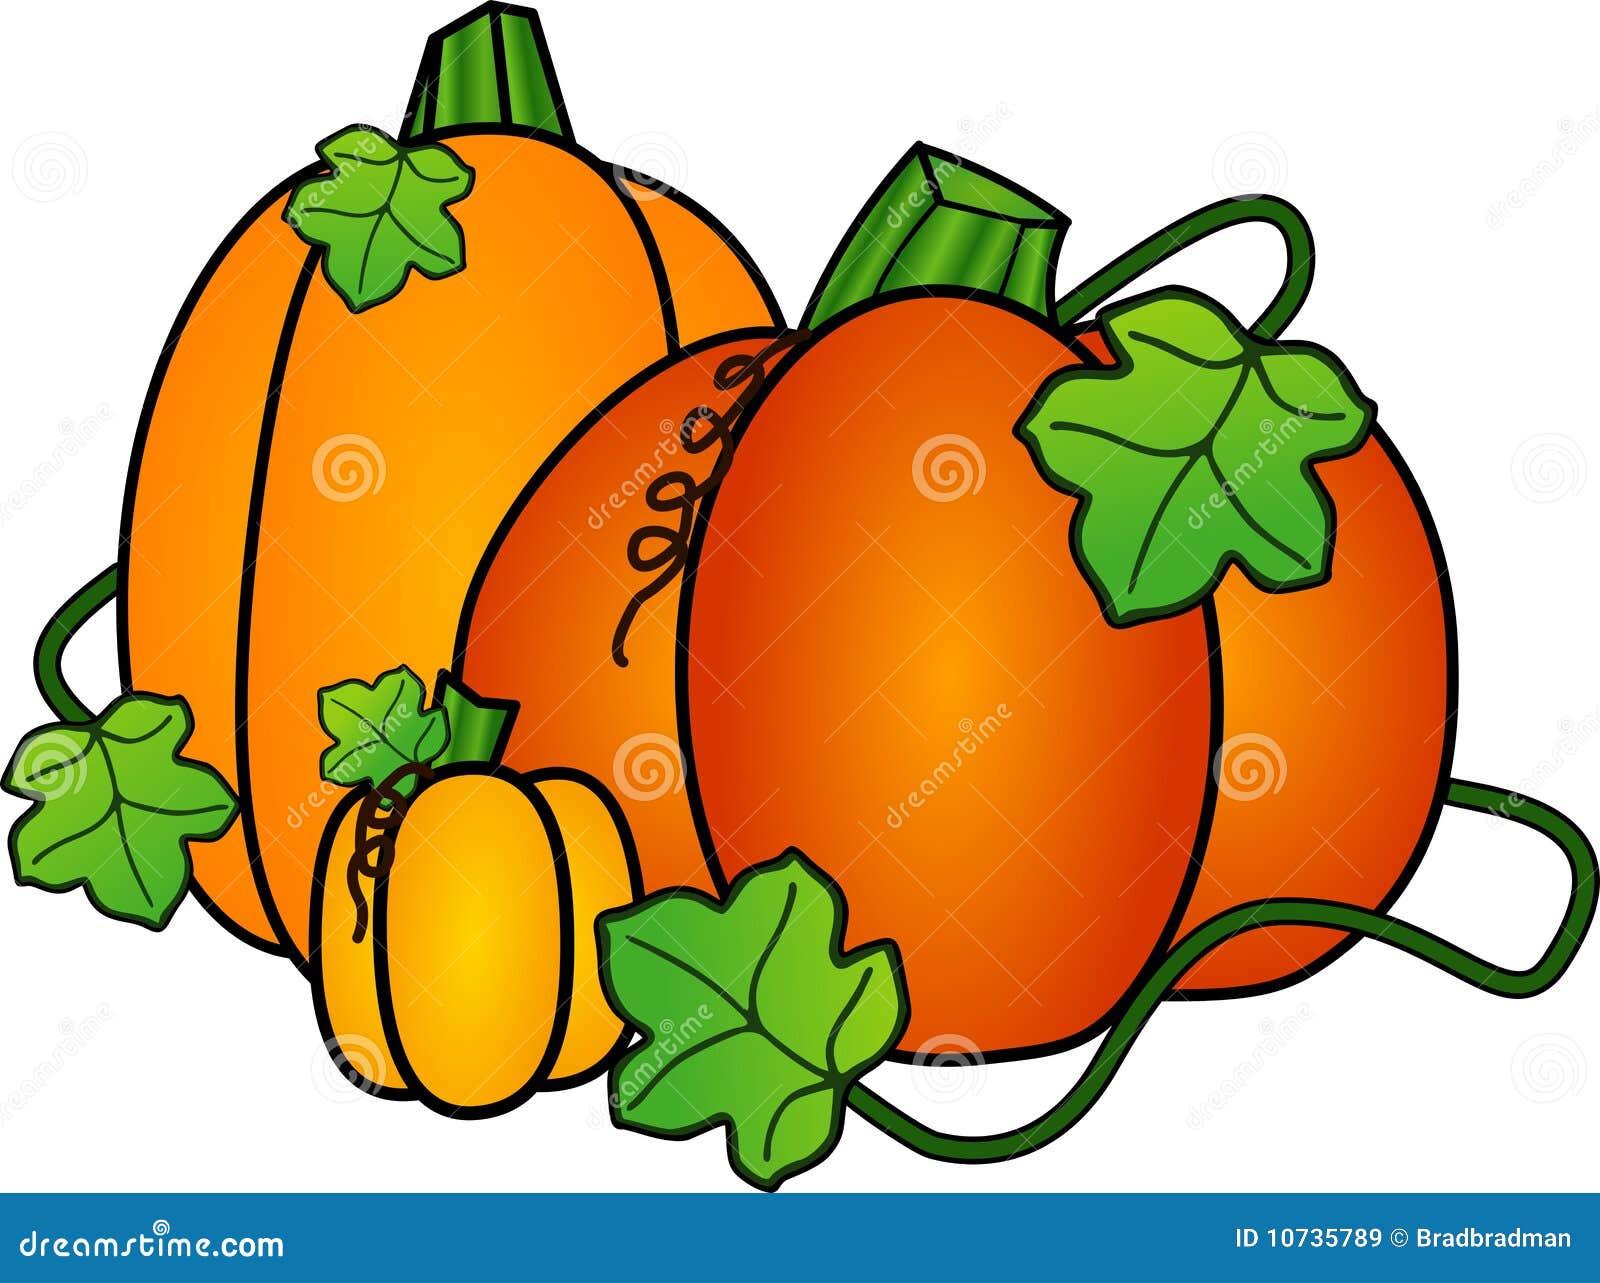 autumn pumpkins stock illustration illustration of october 10735789 rh dreamstime com clipart of pumpkins on the vine clipart of pumpkins and leaves